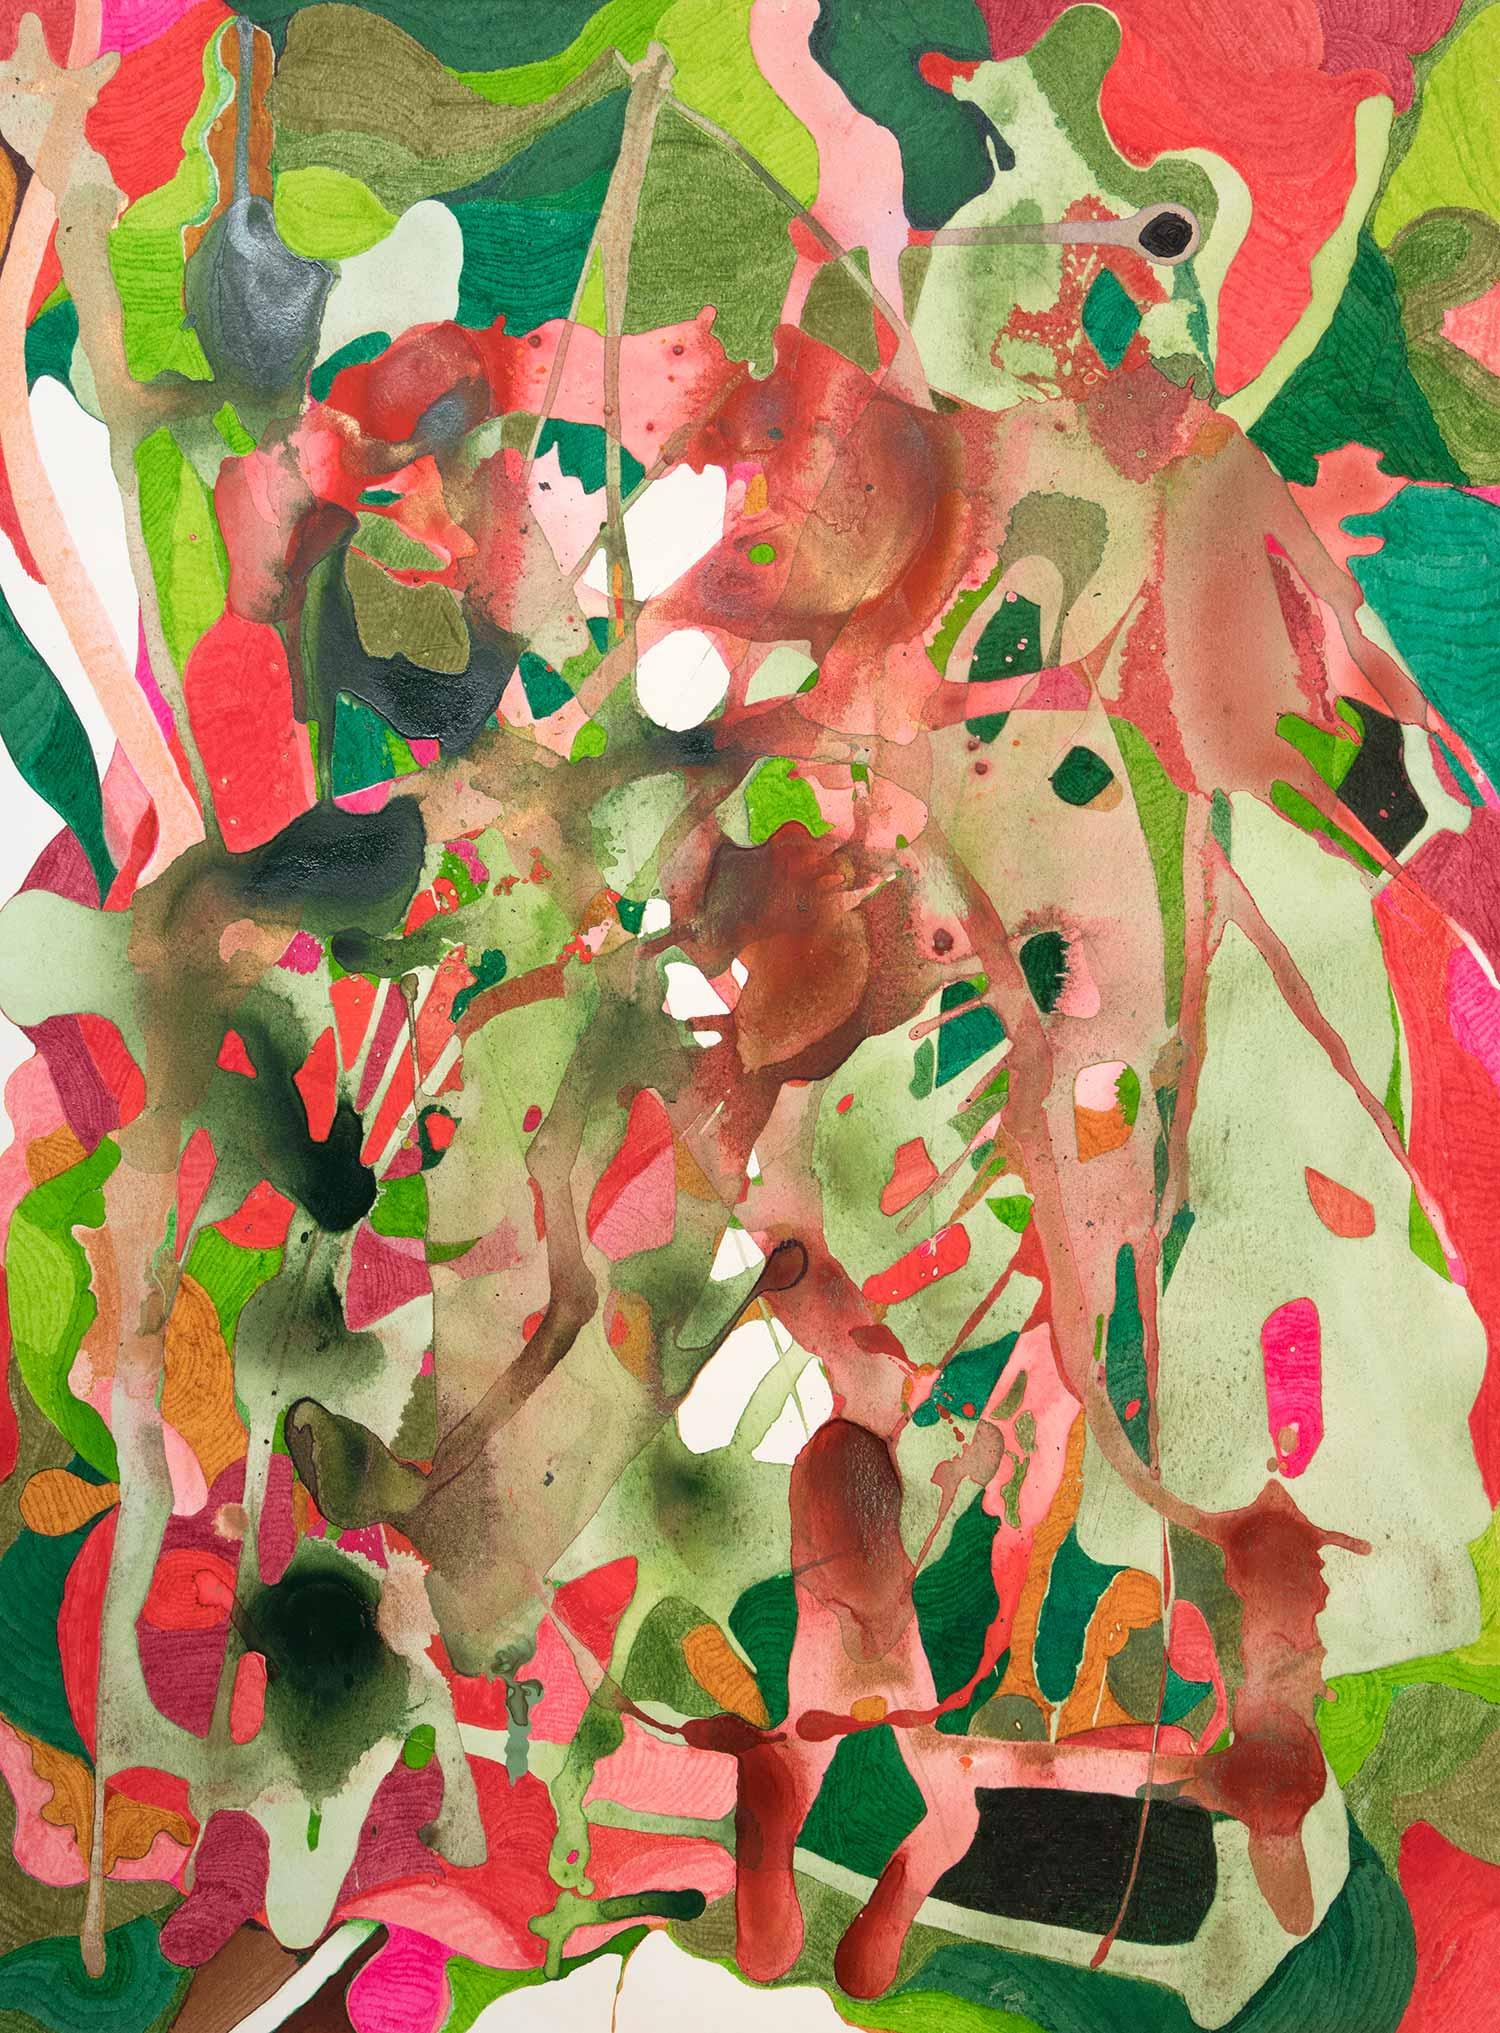 <b>Smashing Pumpkings</b><br> Acrílico y rotulador sobre papel<br> 76 x 19 cm (2015)